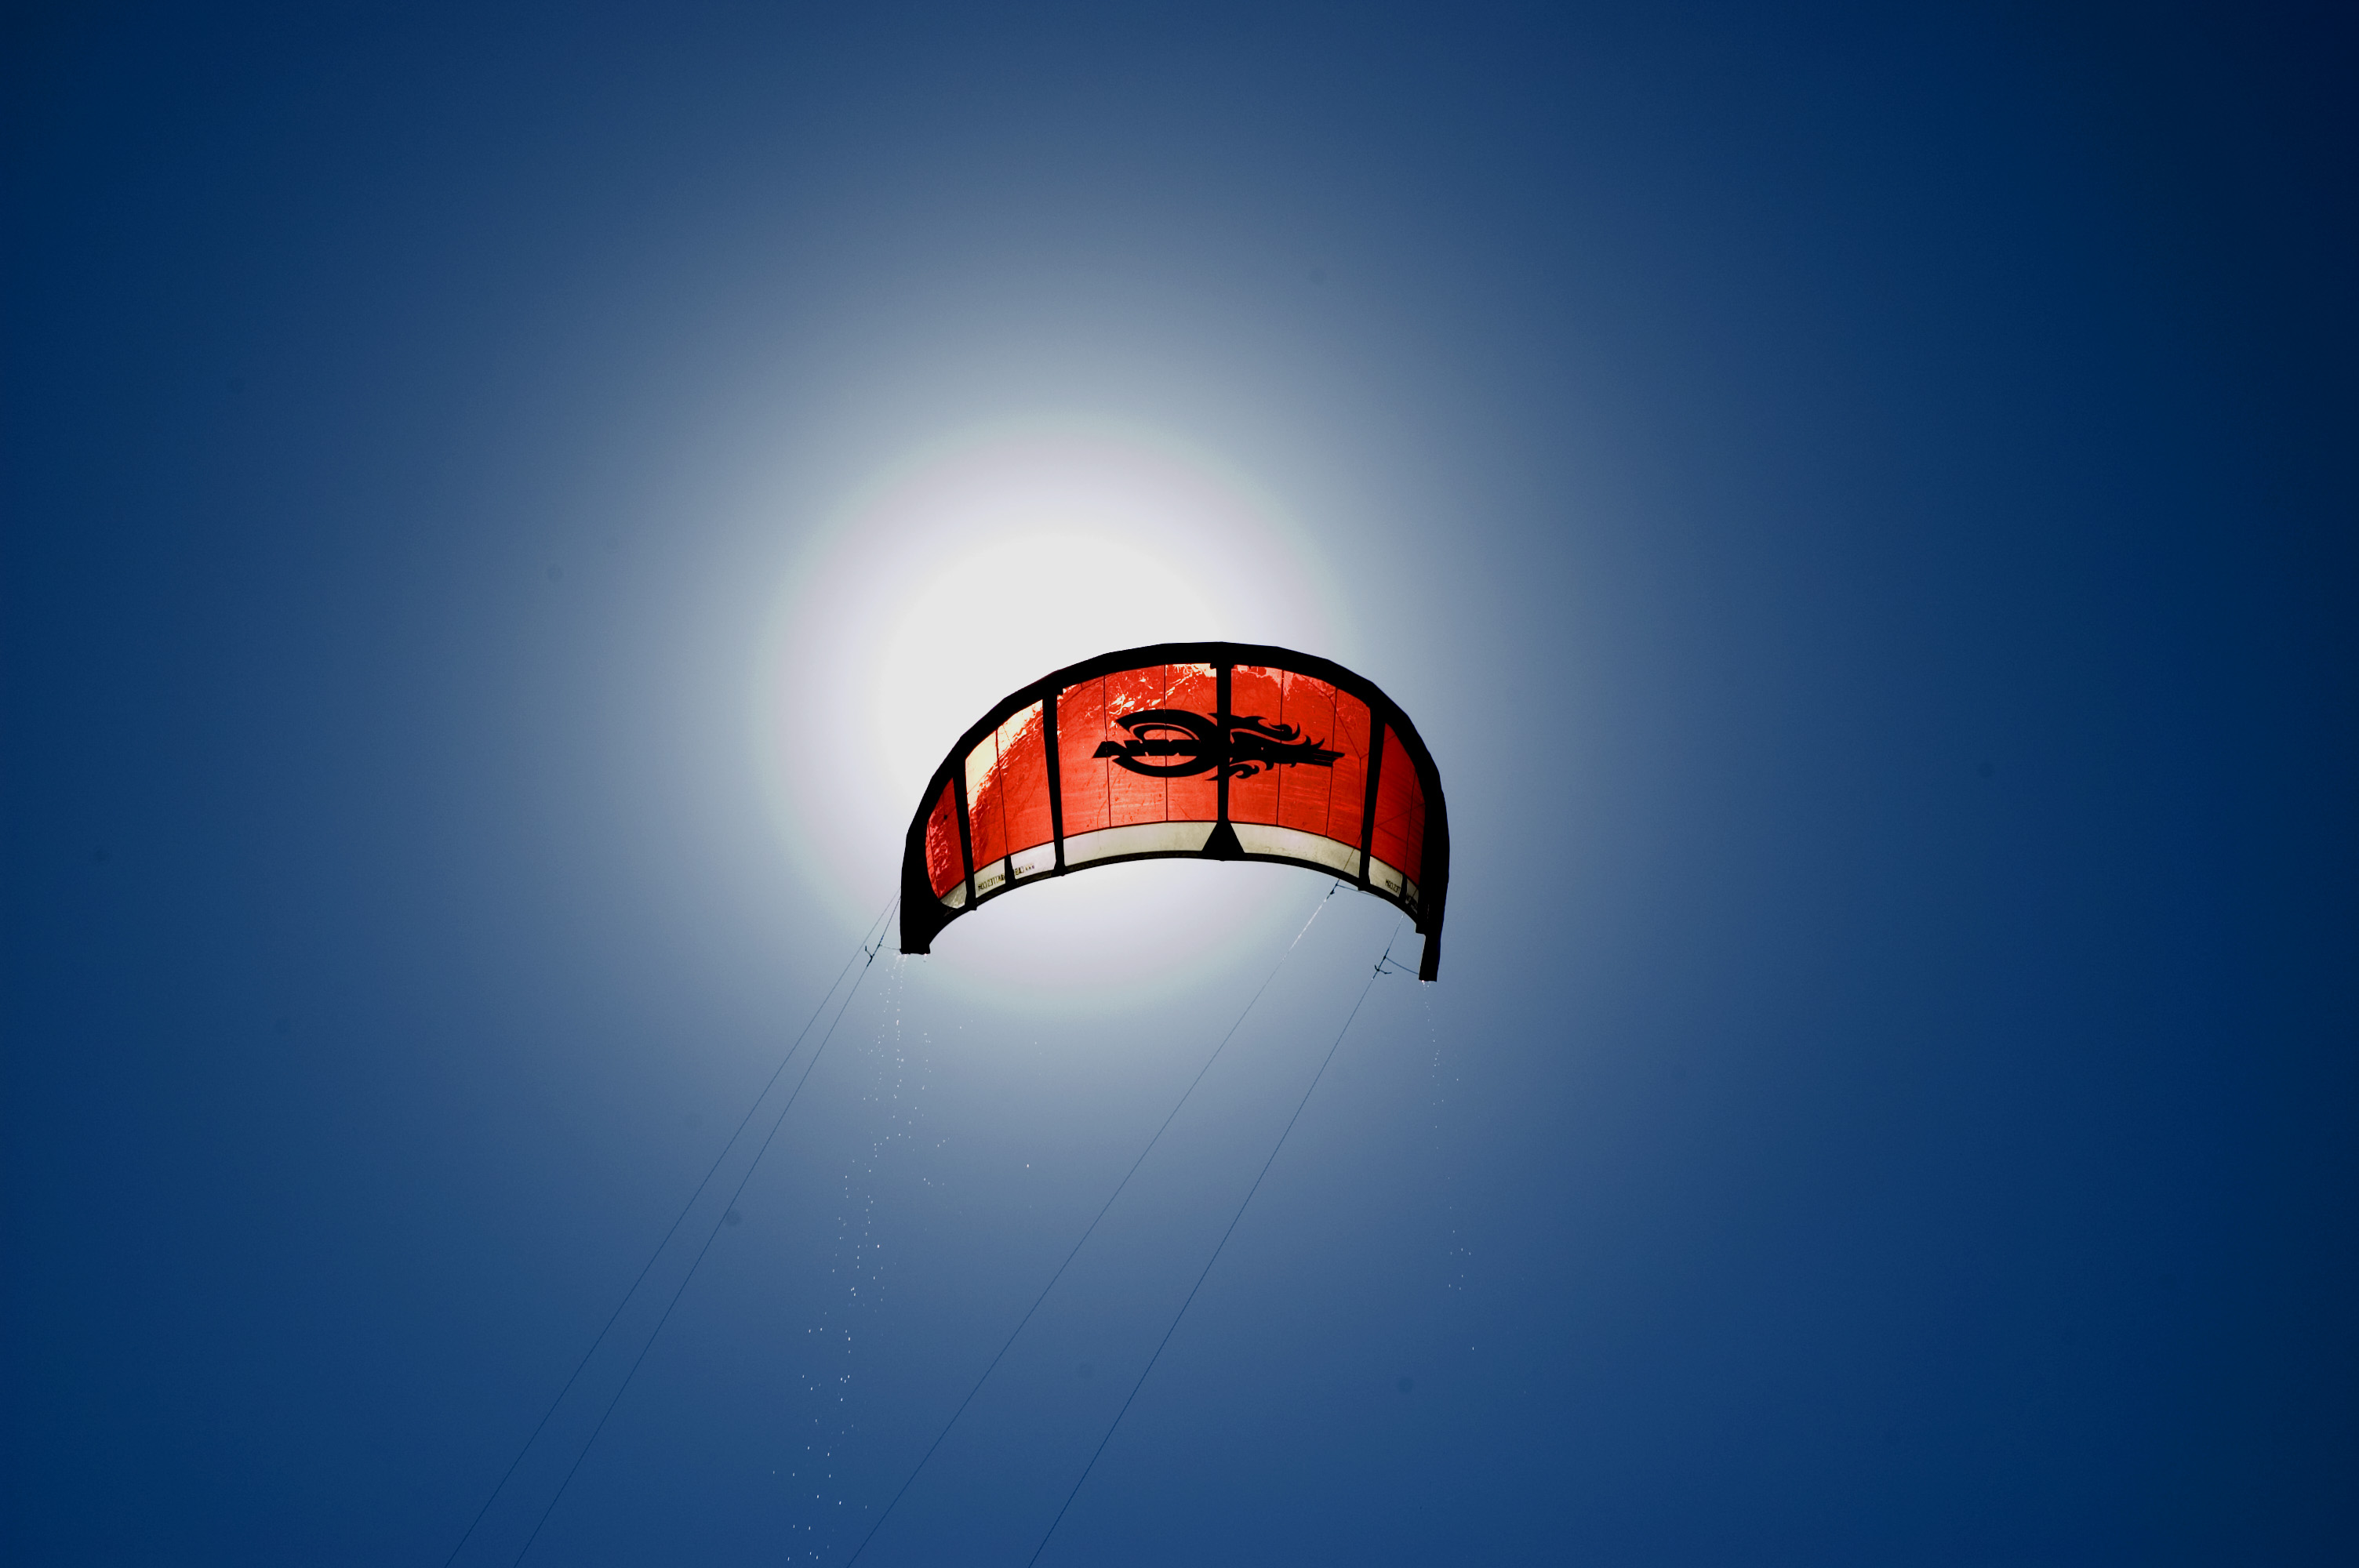 kite, Blue, Fly, Glide, Parasail, HQ Photo